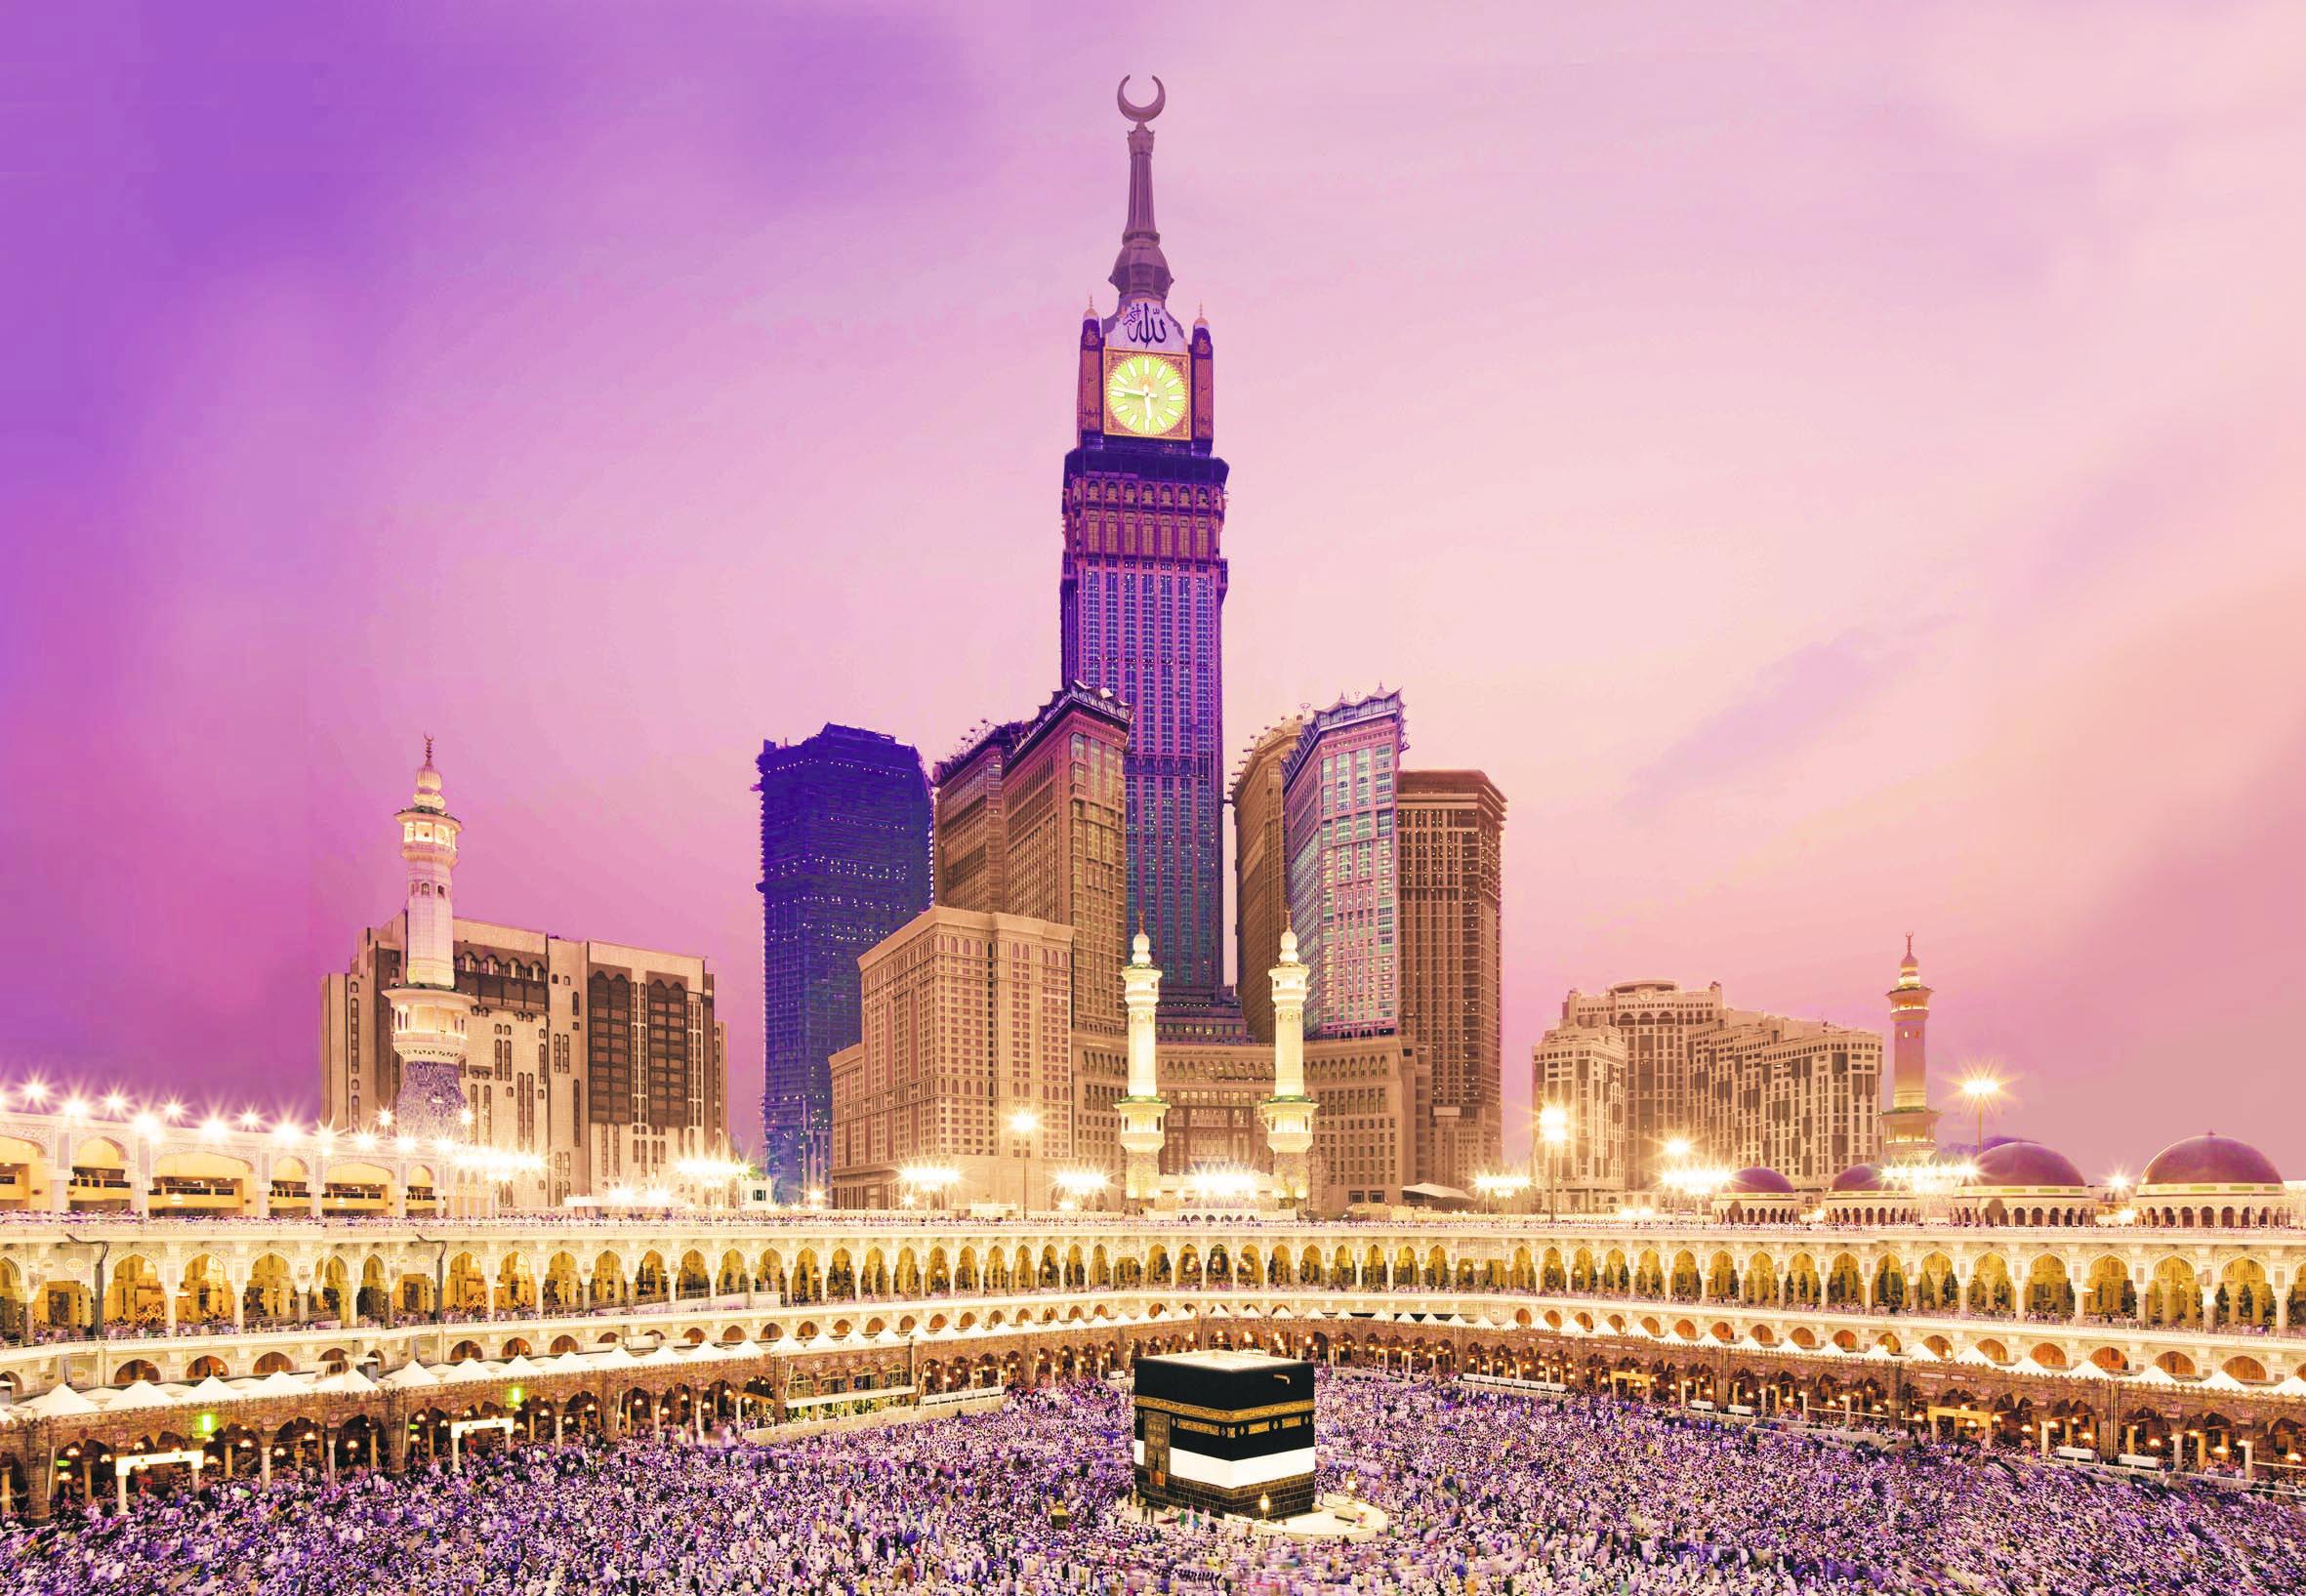 Abraj Al Bait Towers And Ka Bah Mekkah Desktop Backgrounds For Free Hd Wallpaper Wall Art Com Mekkah Mekah Mesjid